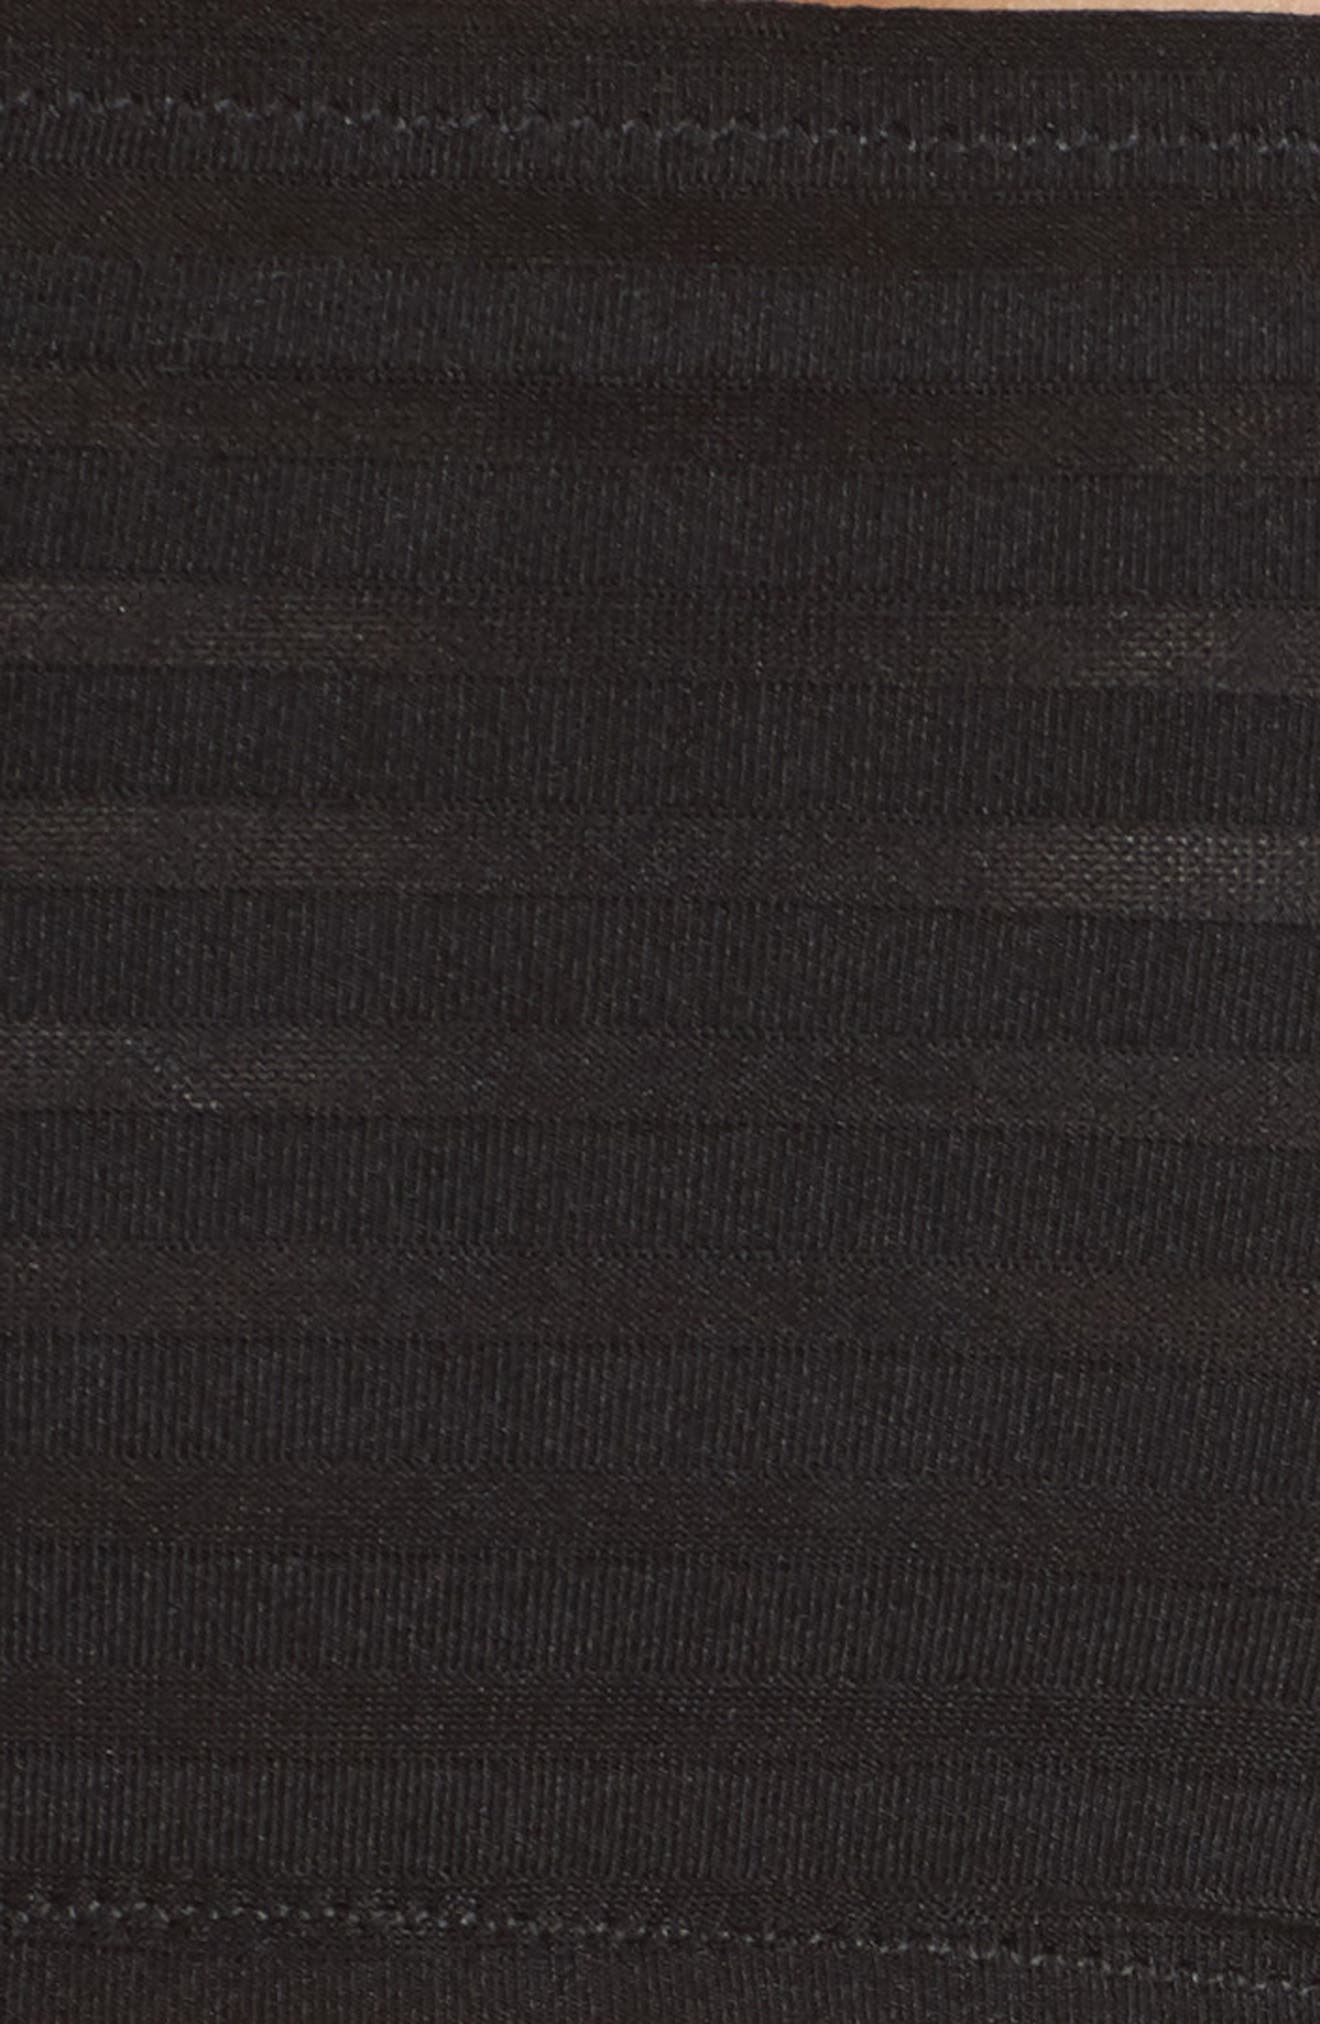 Sheer Stripe Bandeau Bralette,                             Alternate thumbnail 7, color,                             001